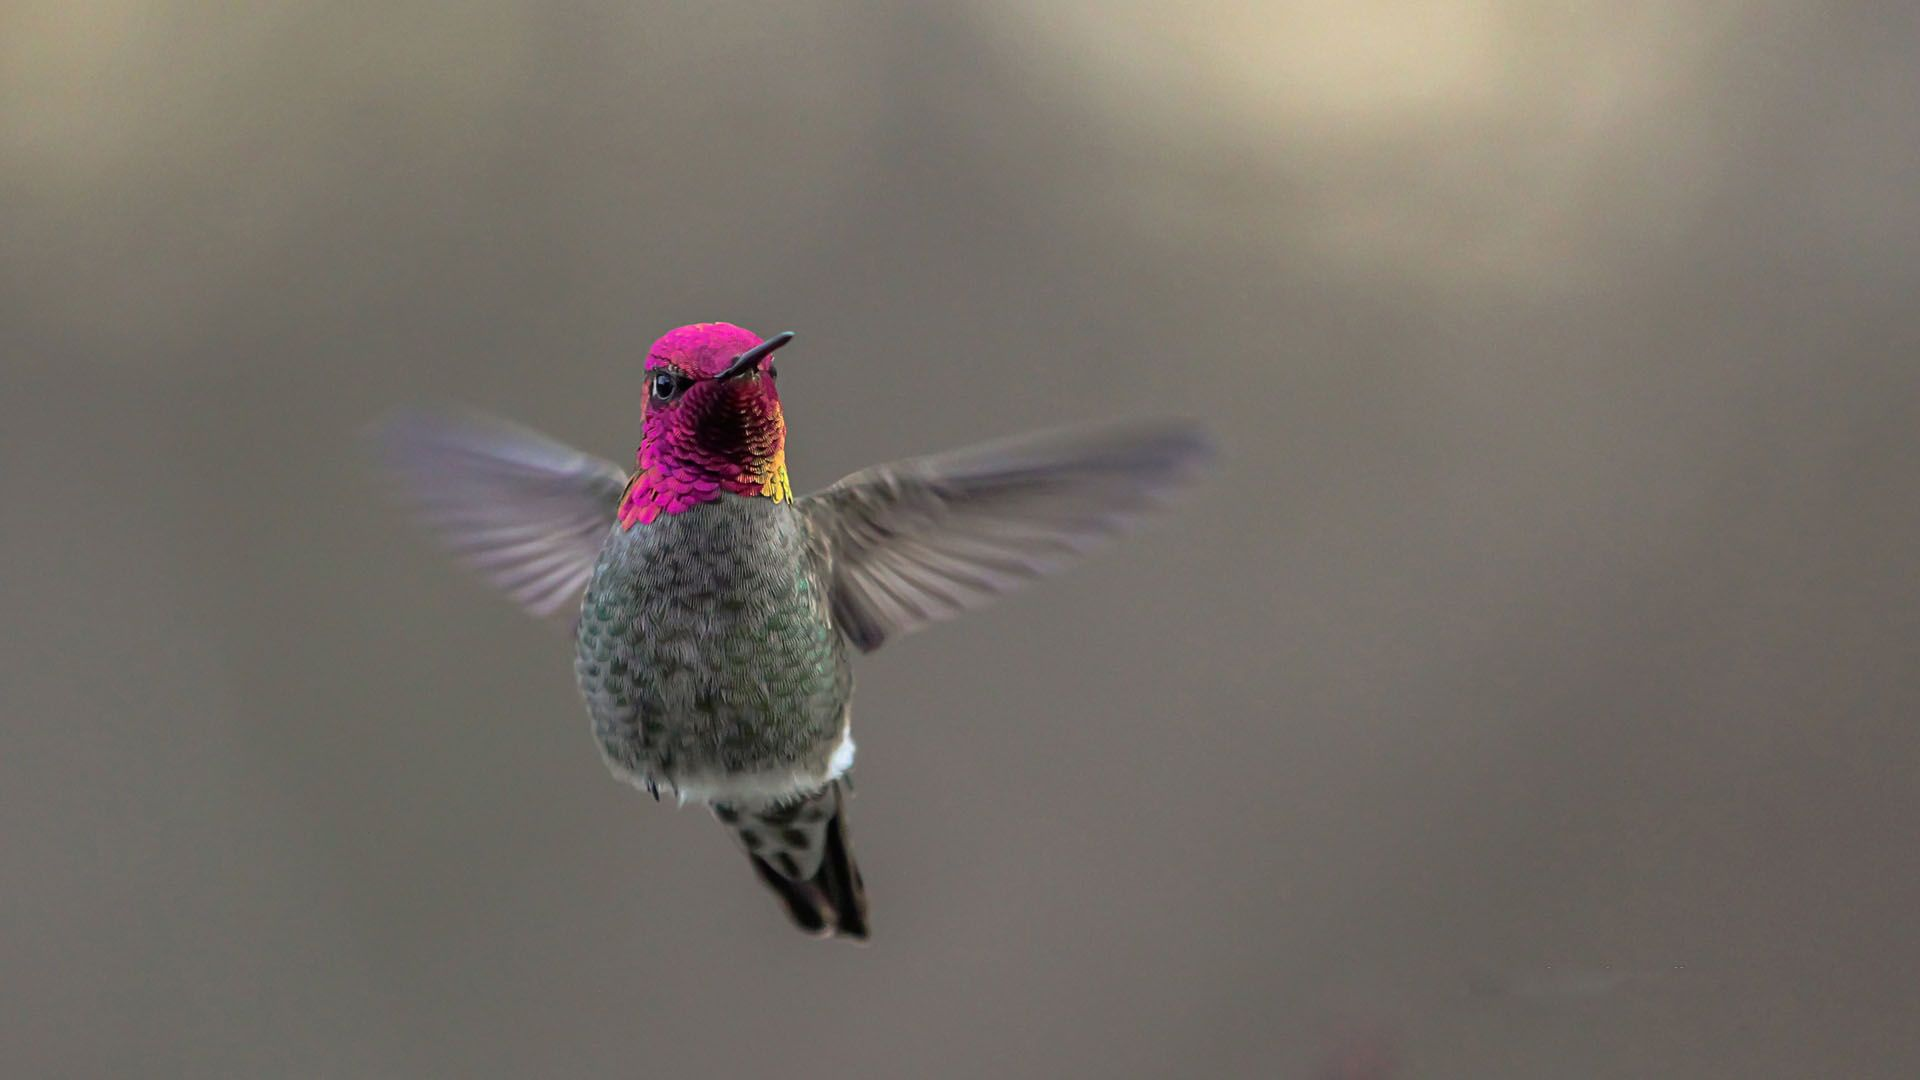 flying hummingbird free download computer wallpapers